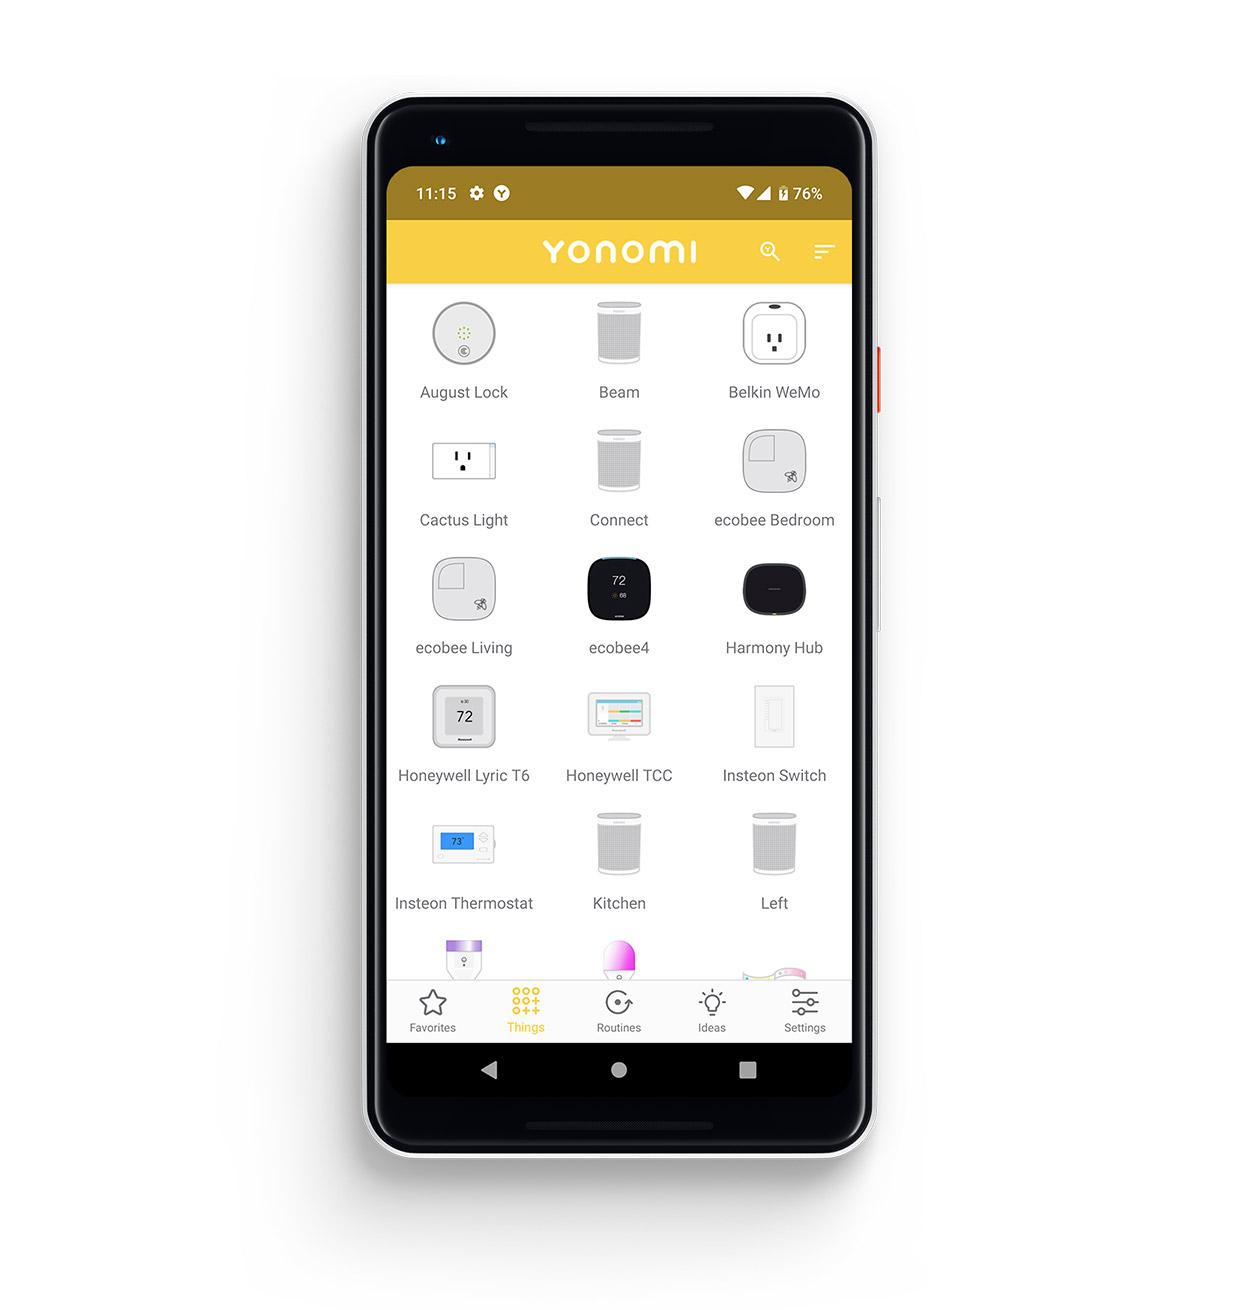 Yonomi - Yonomi App Android Things.jpg